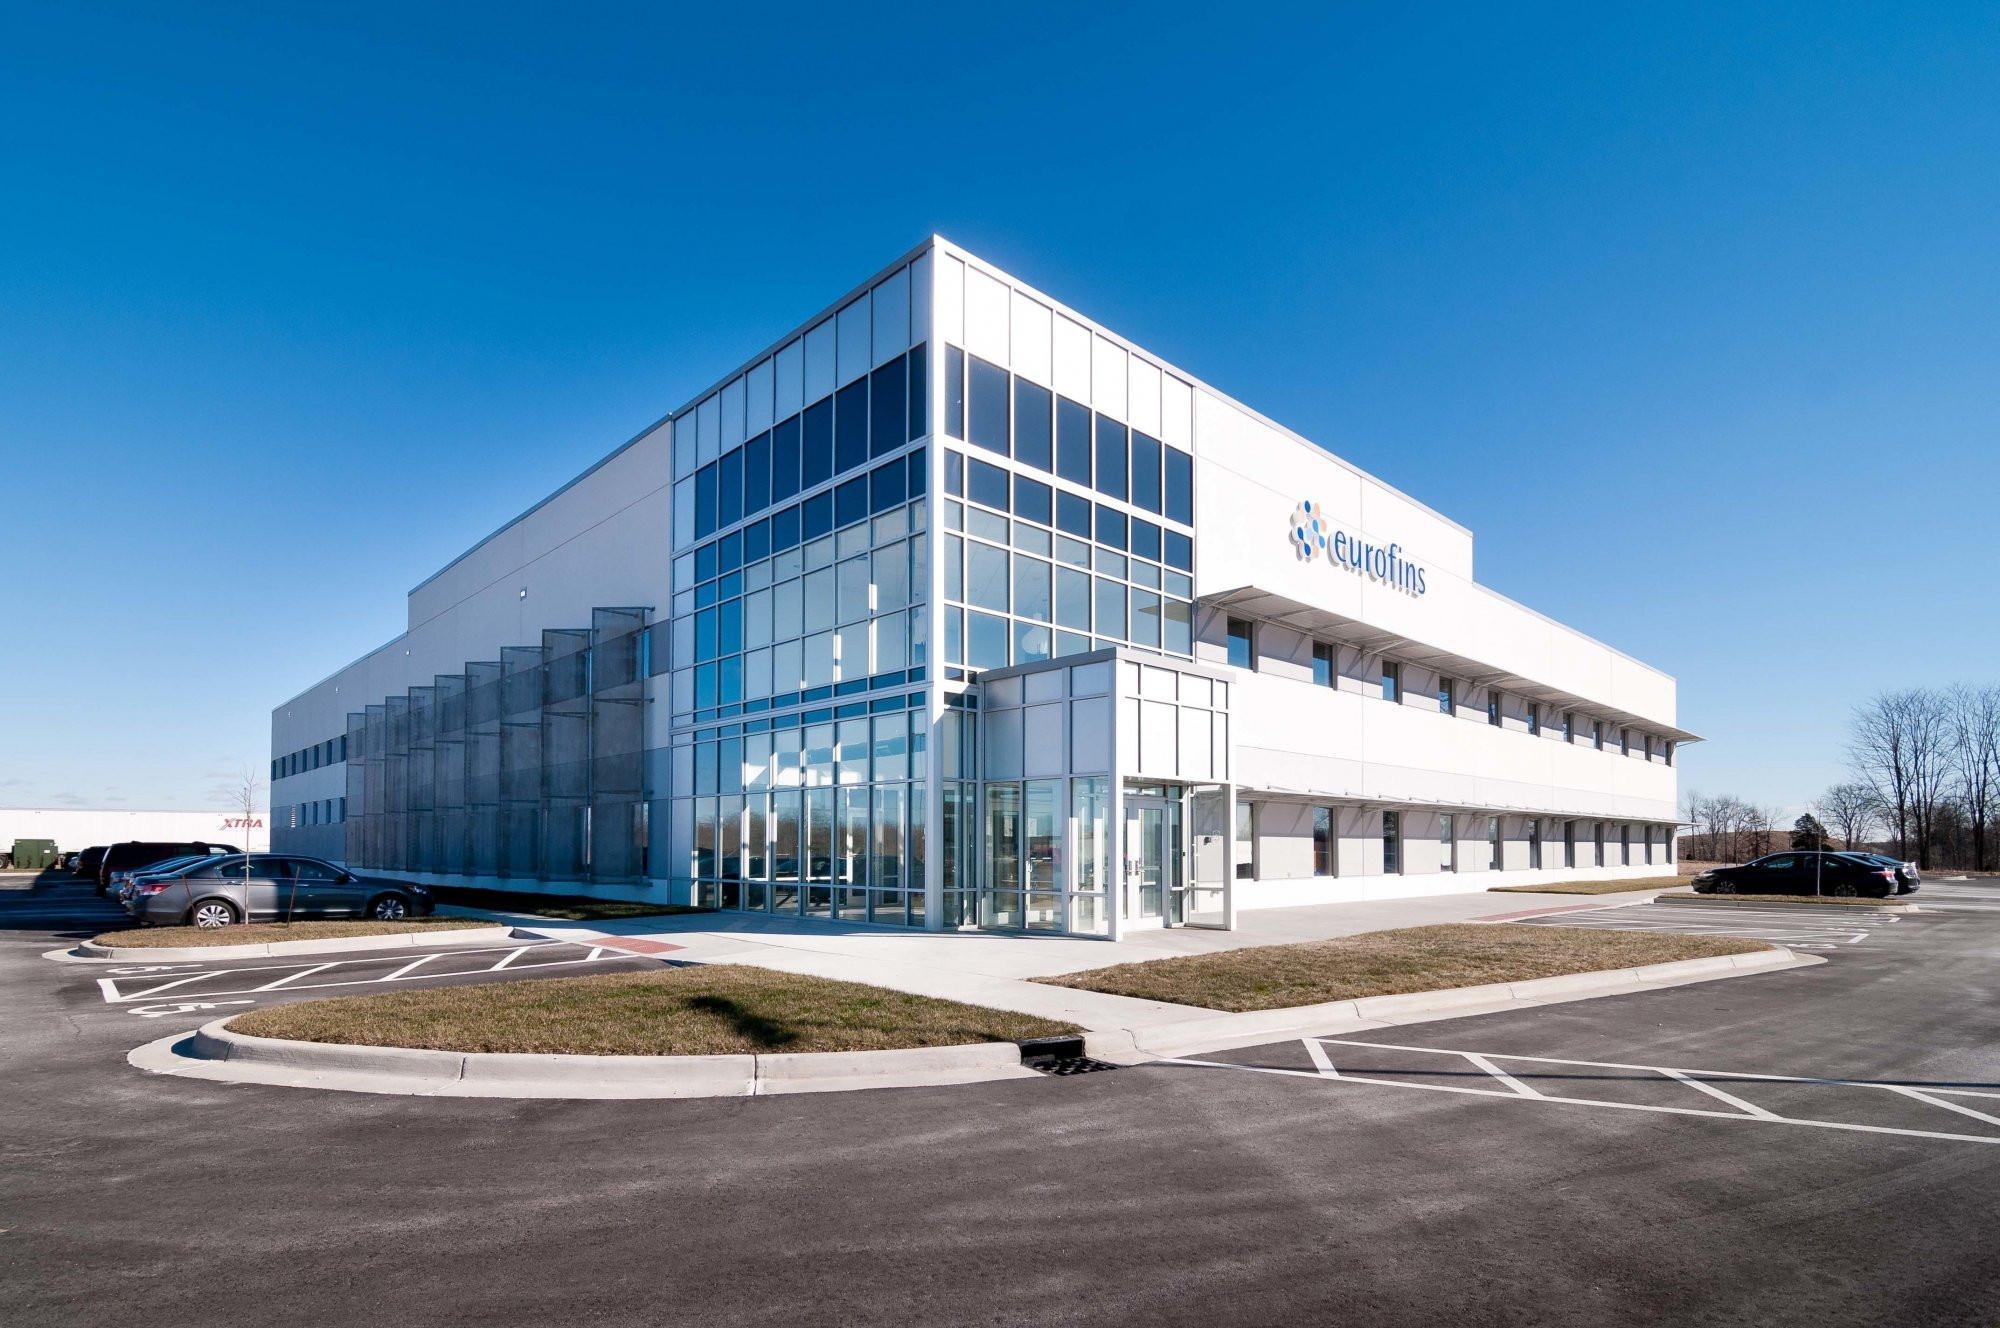 eurofins-office-laboratory-facility-exterior